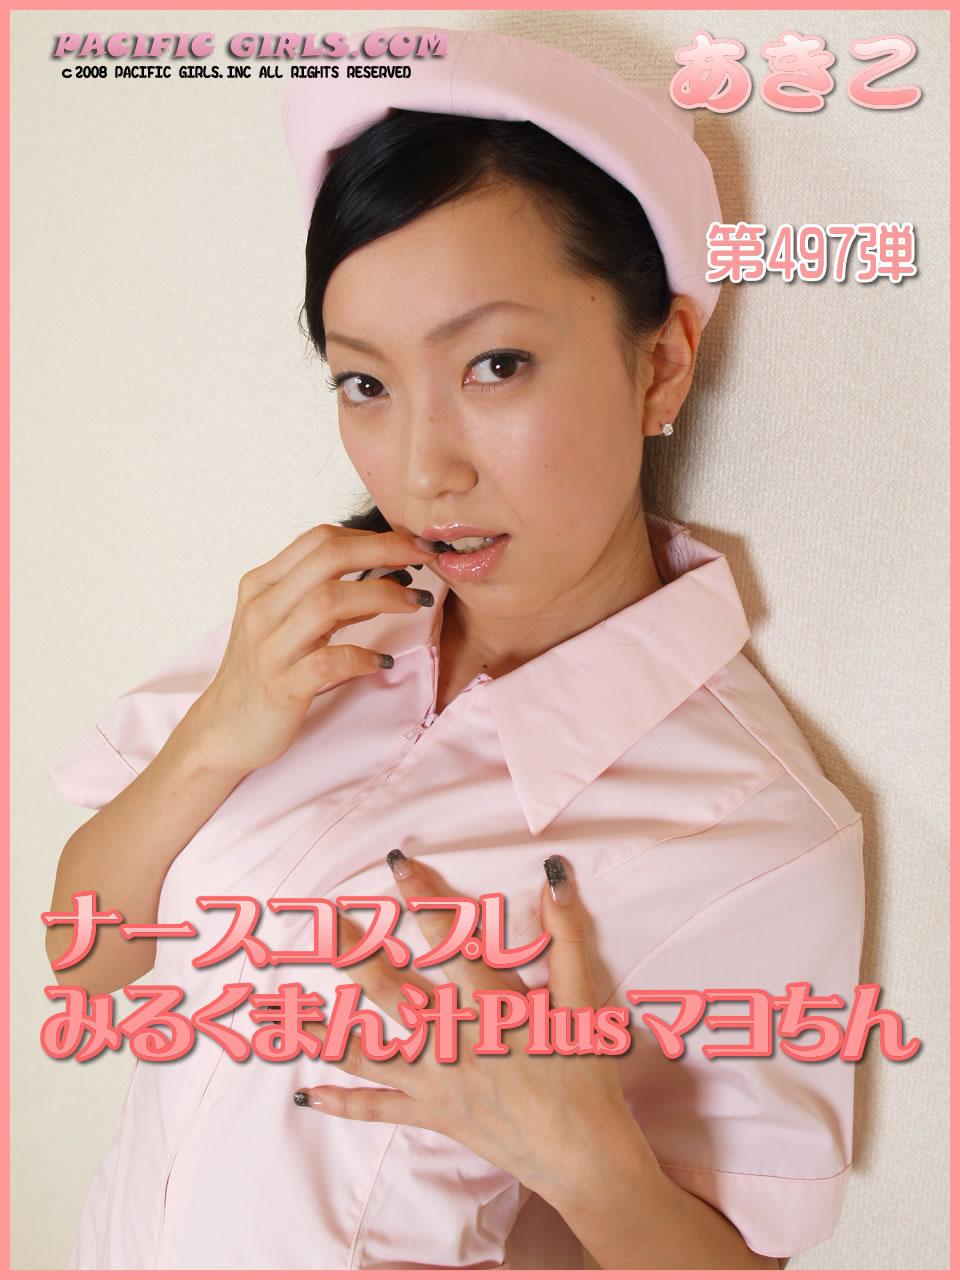 pacificgirls 497 Pacific Girls [M000896 あきこ] Movie 第497弾「ナースコスプレ ...